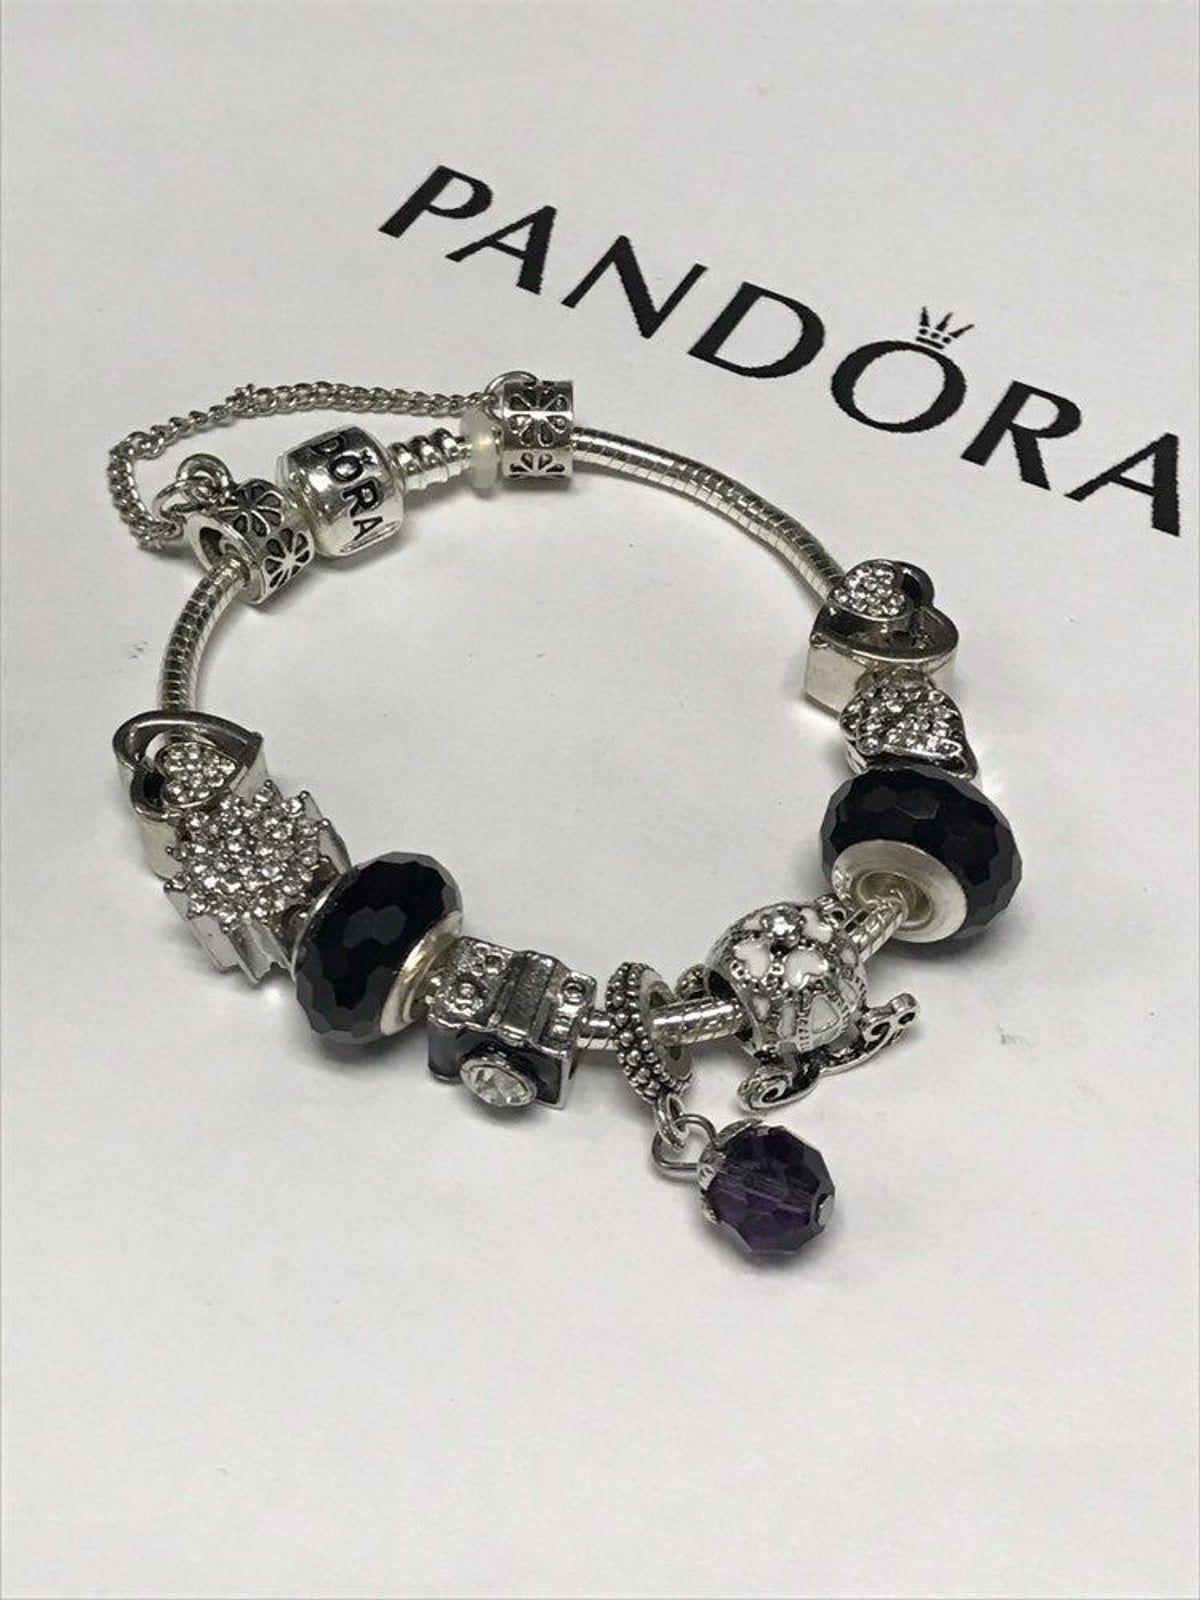 Pandora Black Charm Bracelet In 2020 Black Pandora Bracelet Pandora Black Pandora